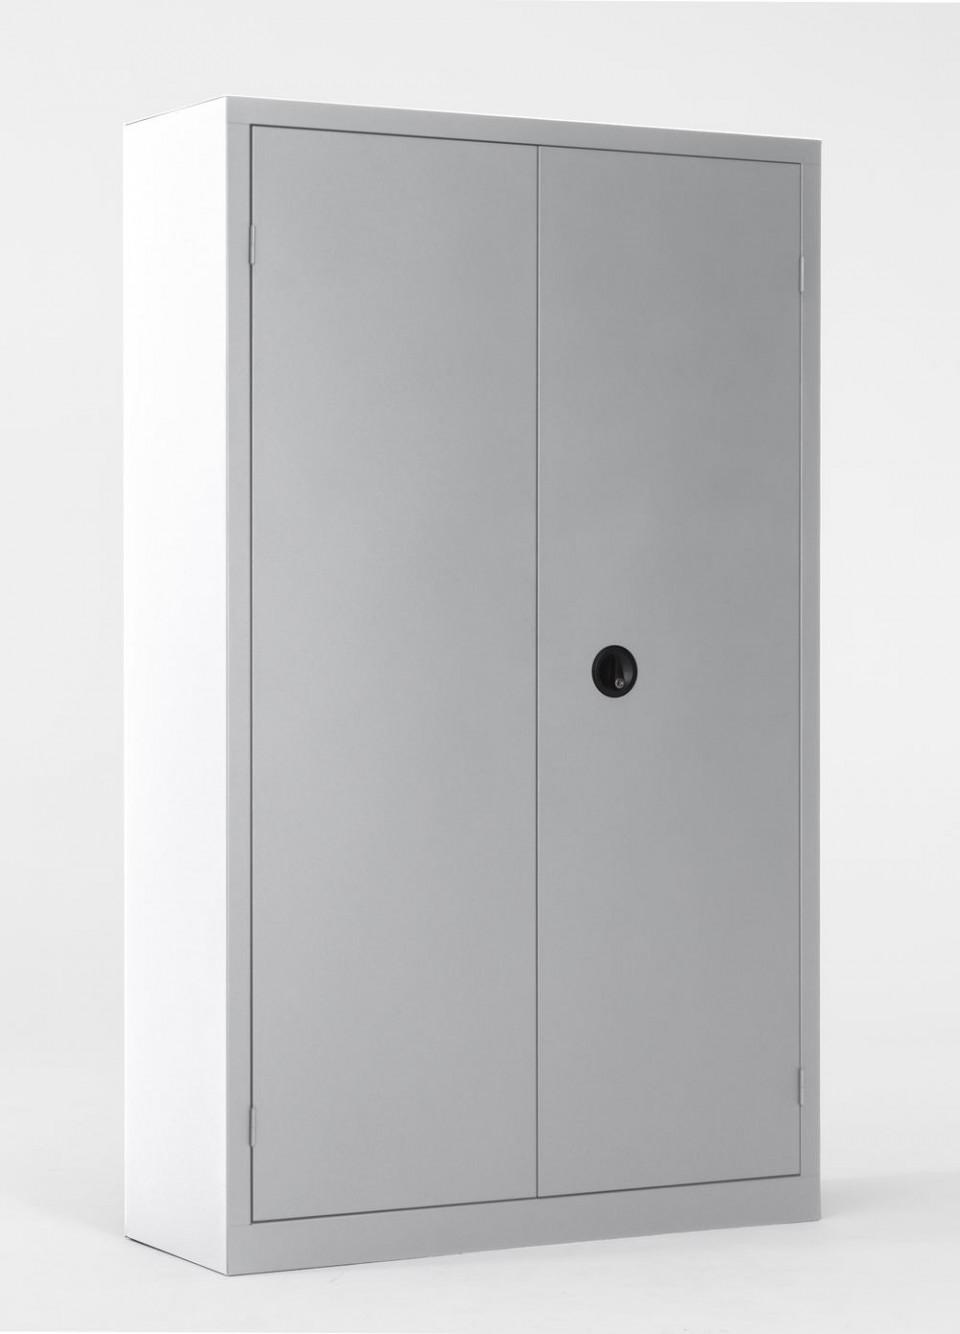 armoire metallique pour garage armoire metallique pour garage armoires de cuisine 25 best. Black Bedroom Furniture Sets. Home Design Ideas